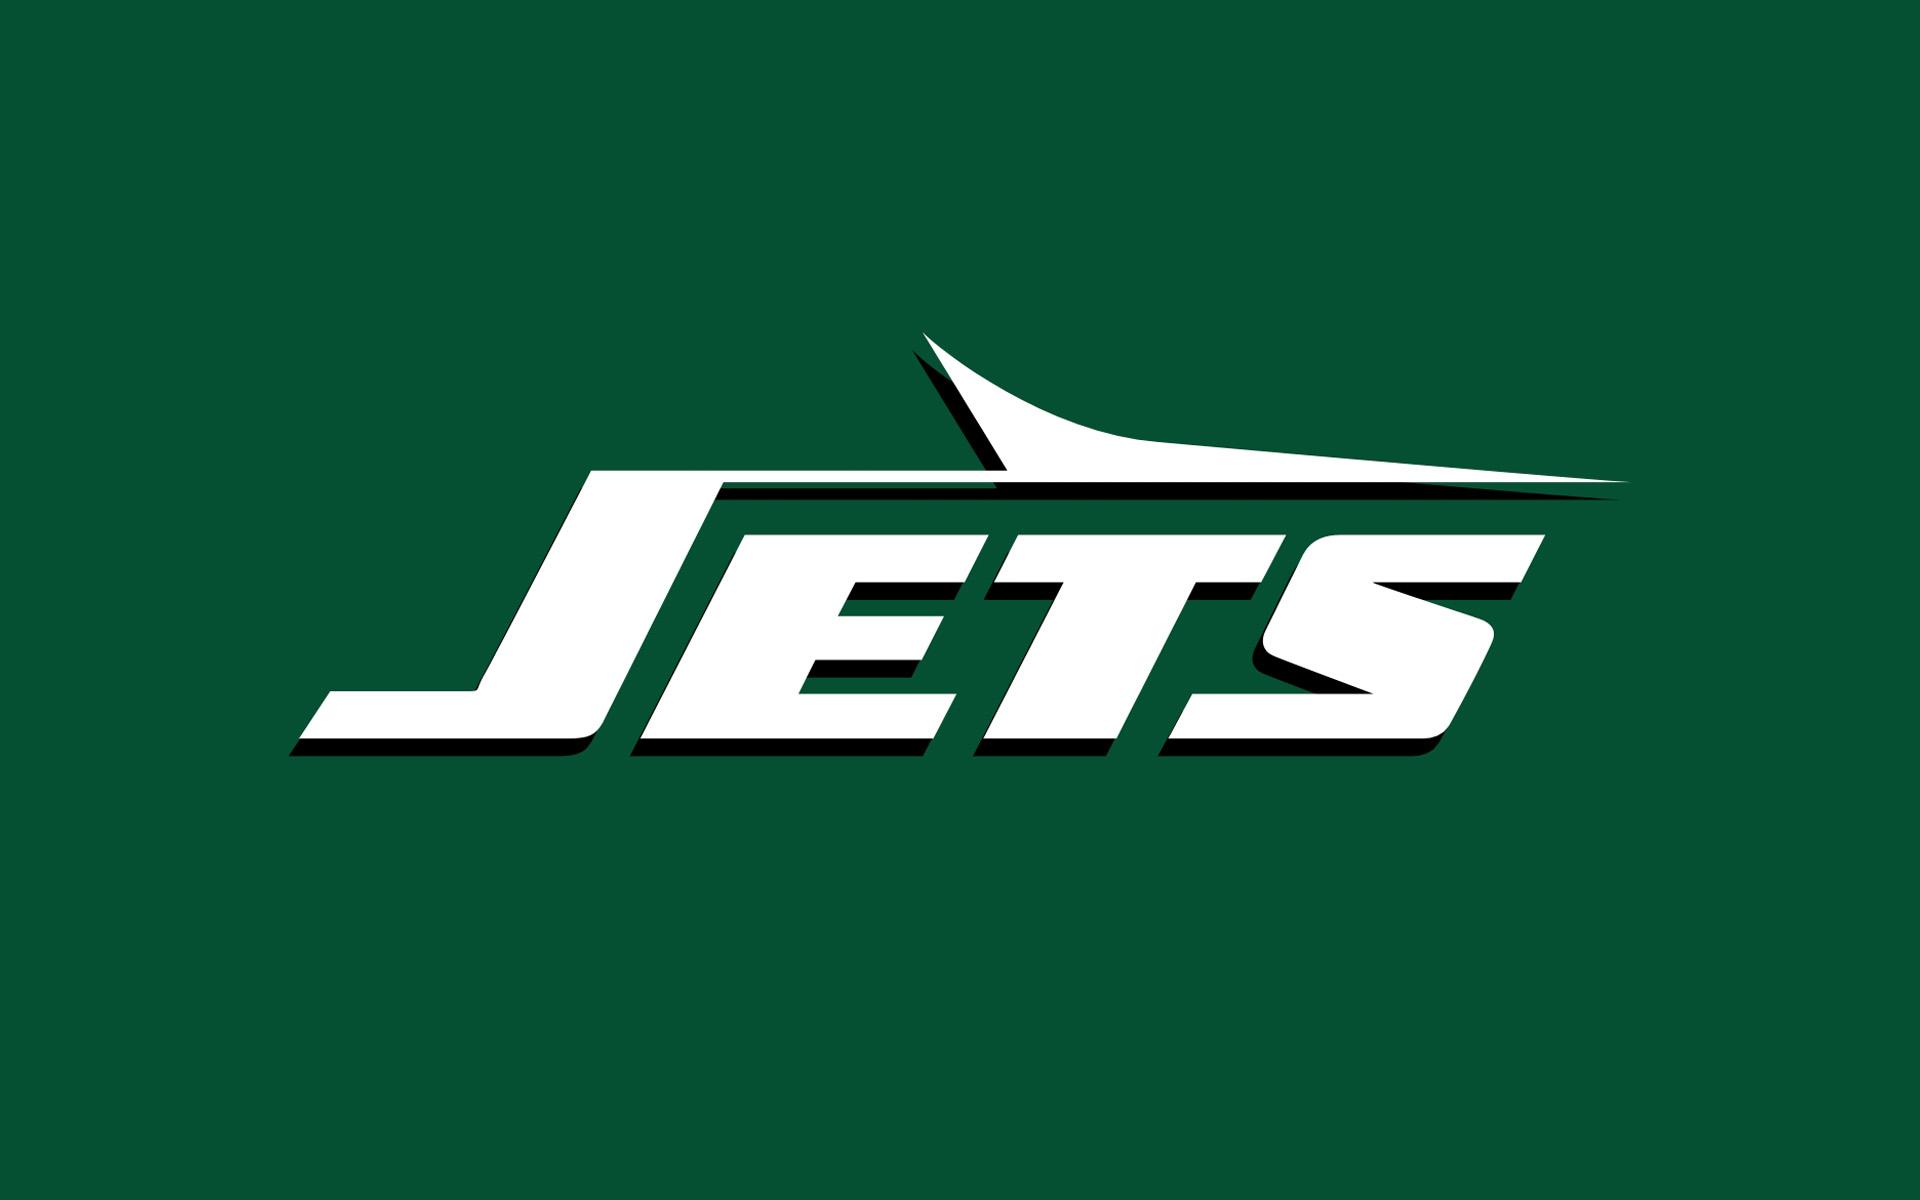 New York Jets Logo wallpaper - 561452 Ubuntu Font